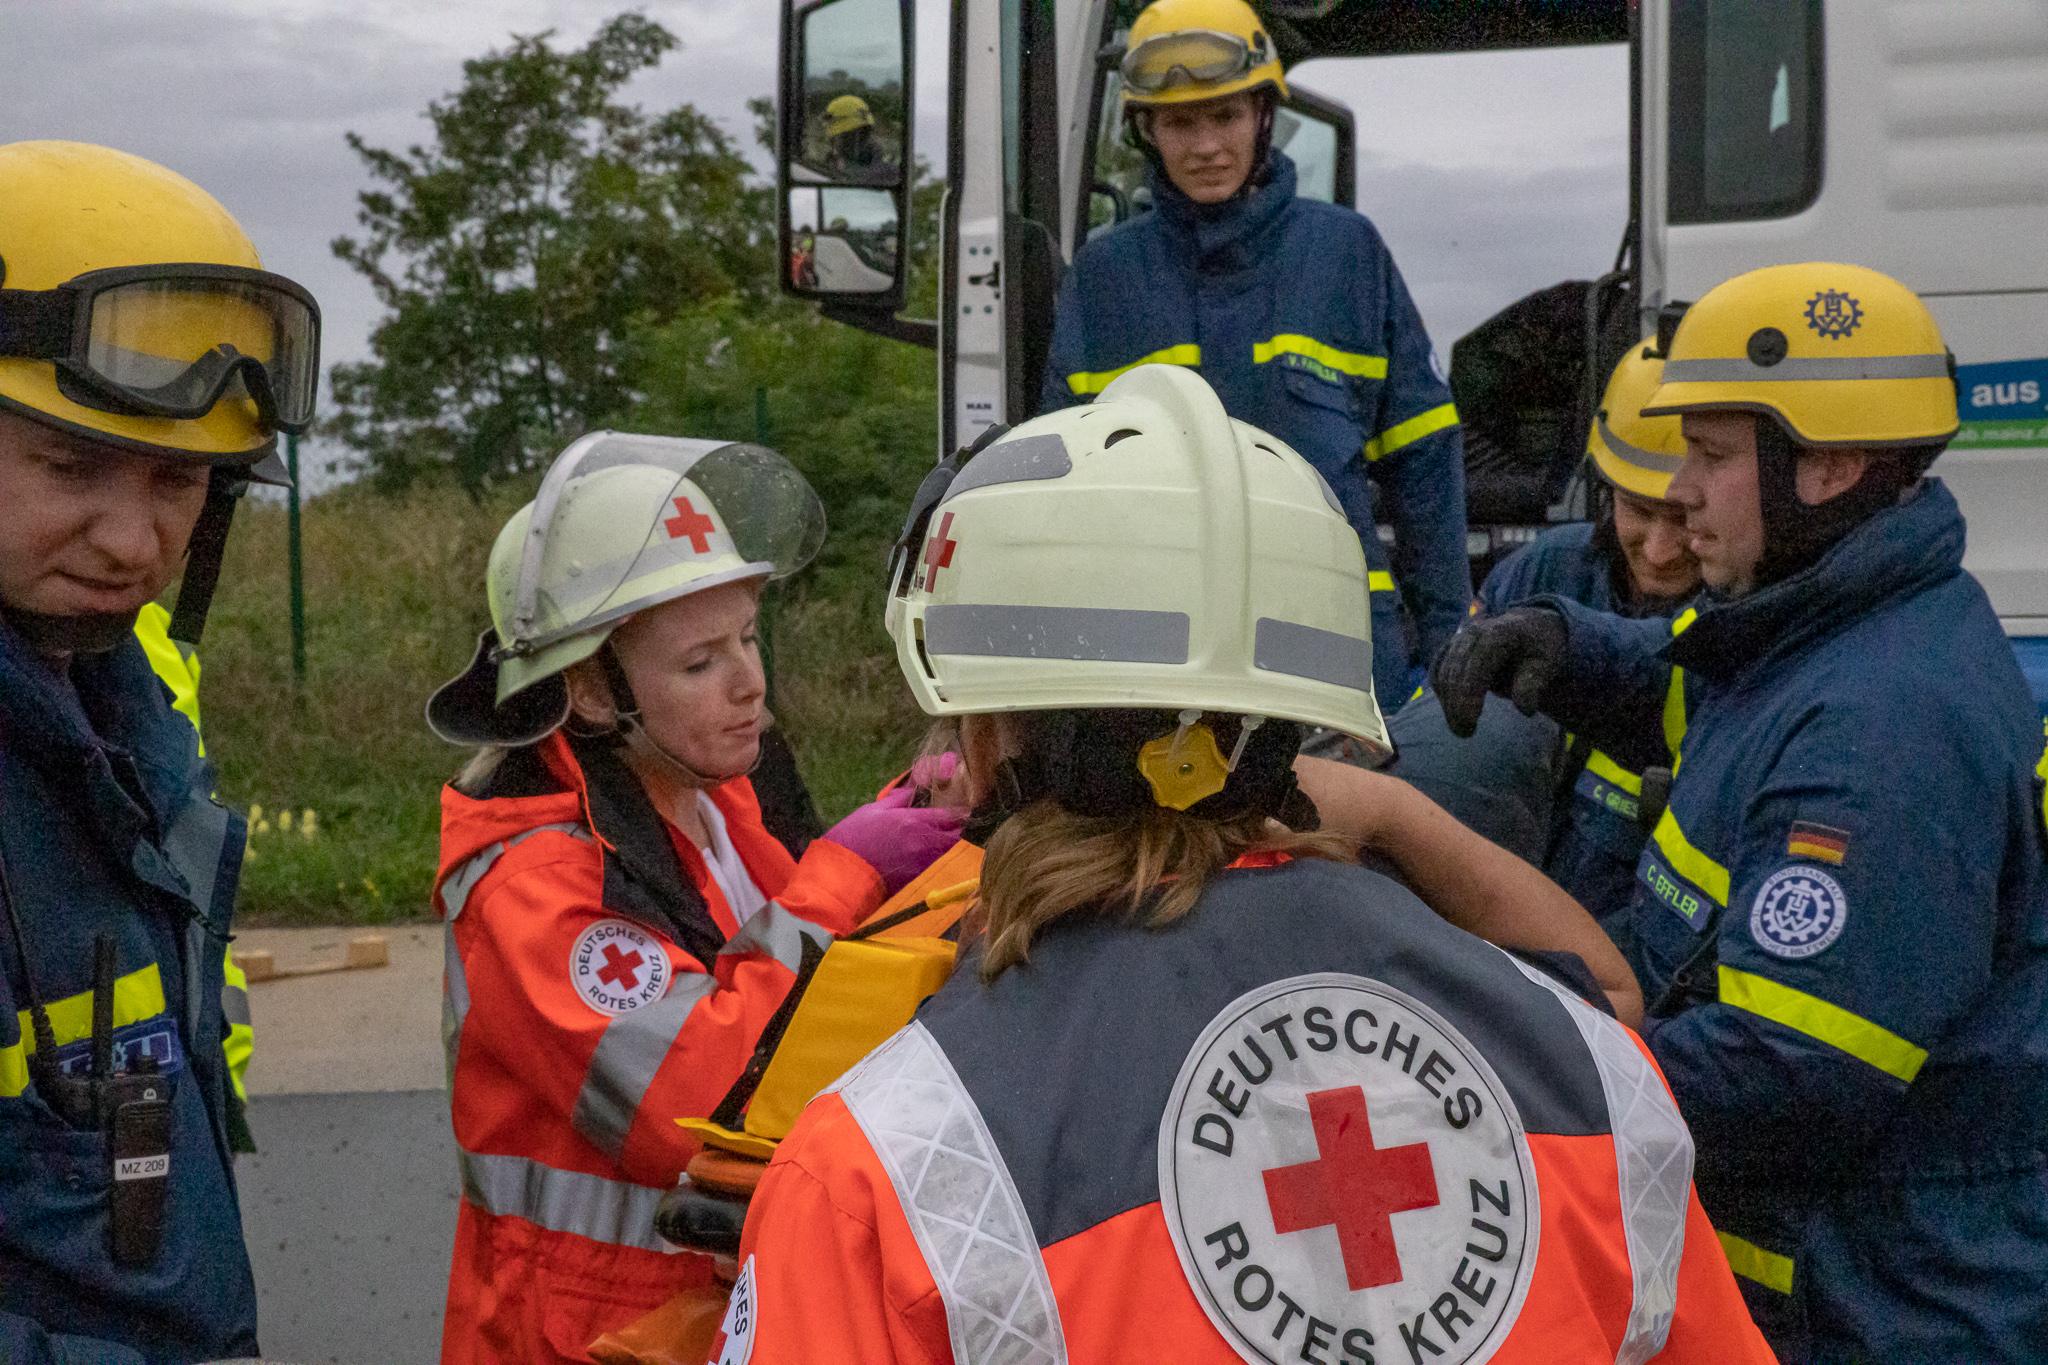 FeuerwehrSim 2019 Henckackerweg-38